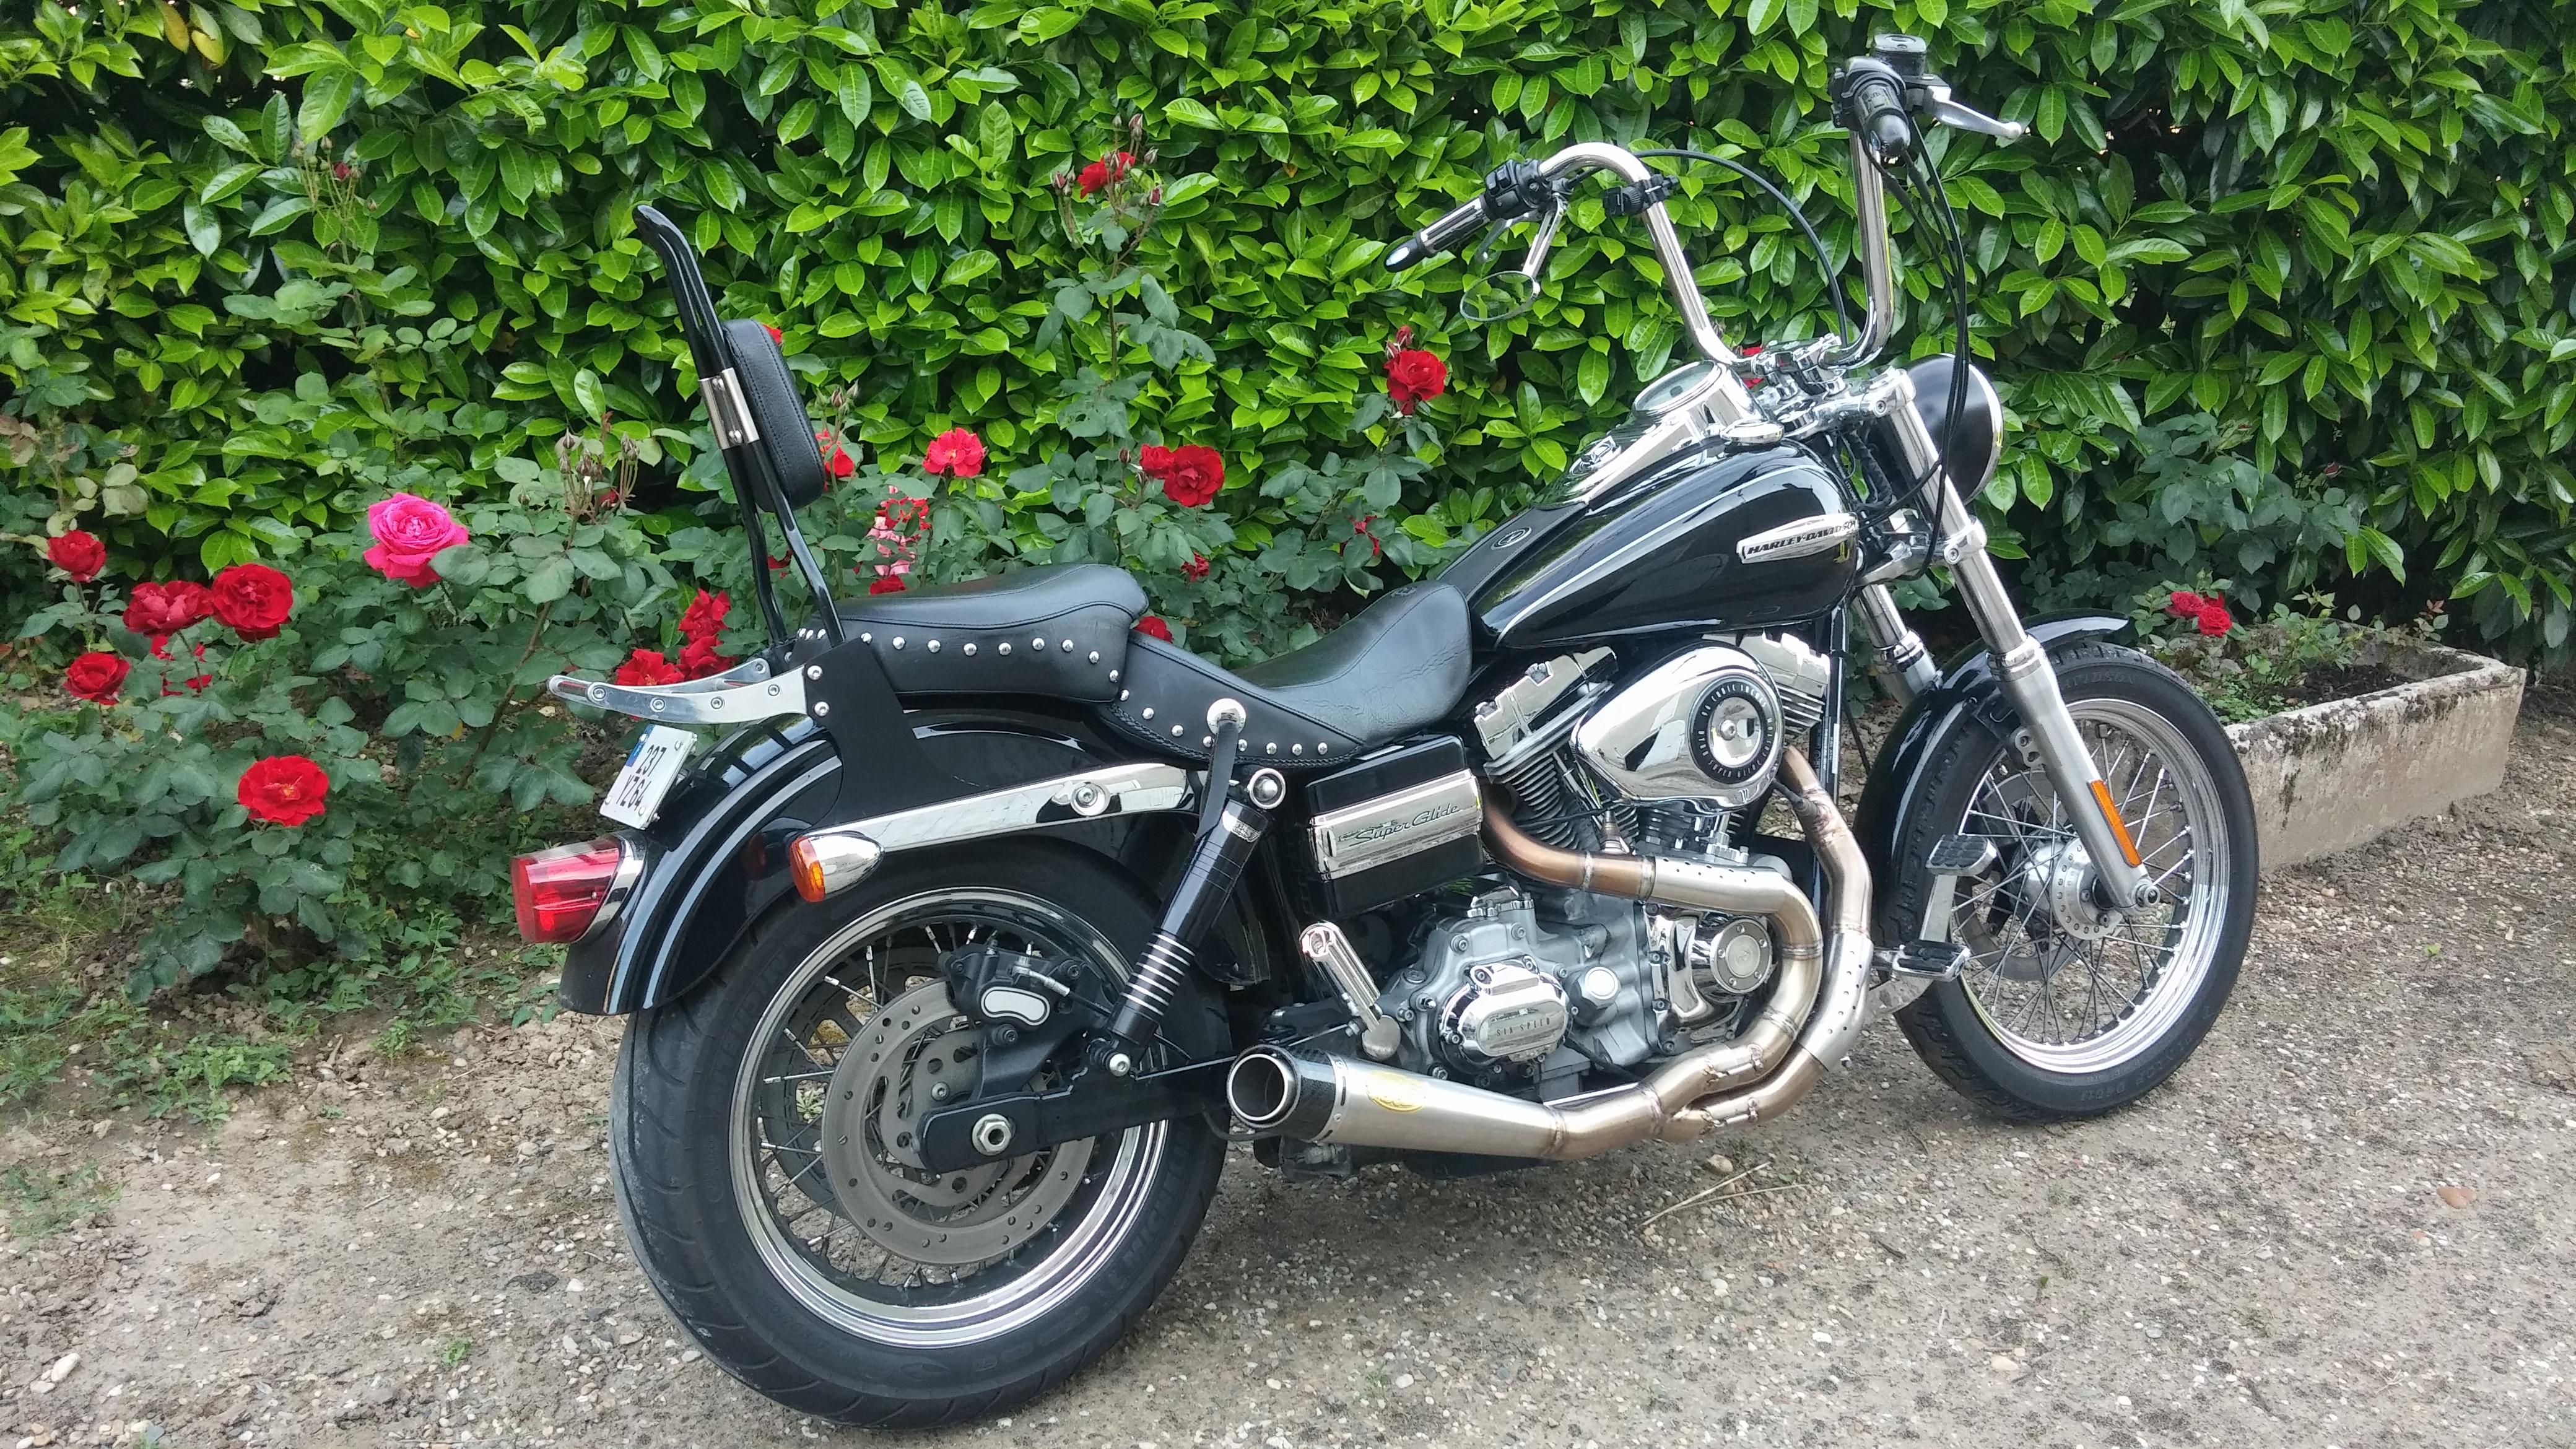 DYNA SUPER GLIDE  combien sommes nous sur Passion-Harley - Page 5 25714120160527185600